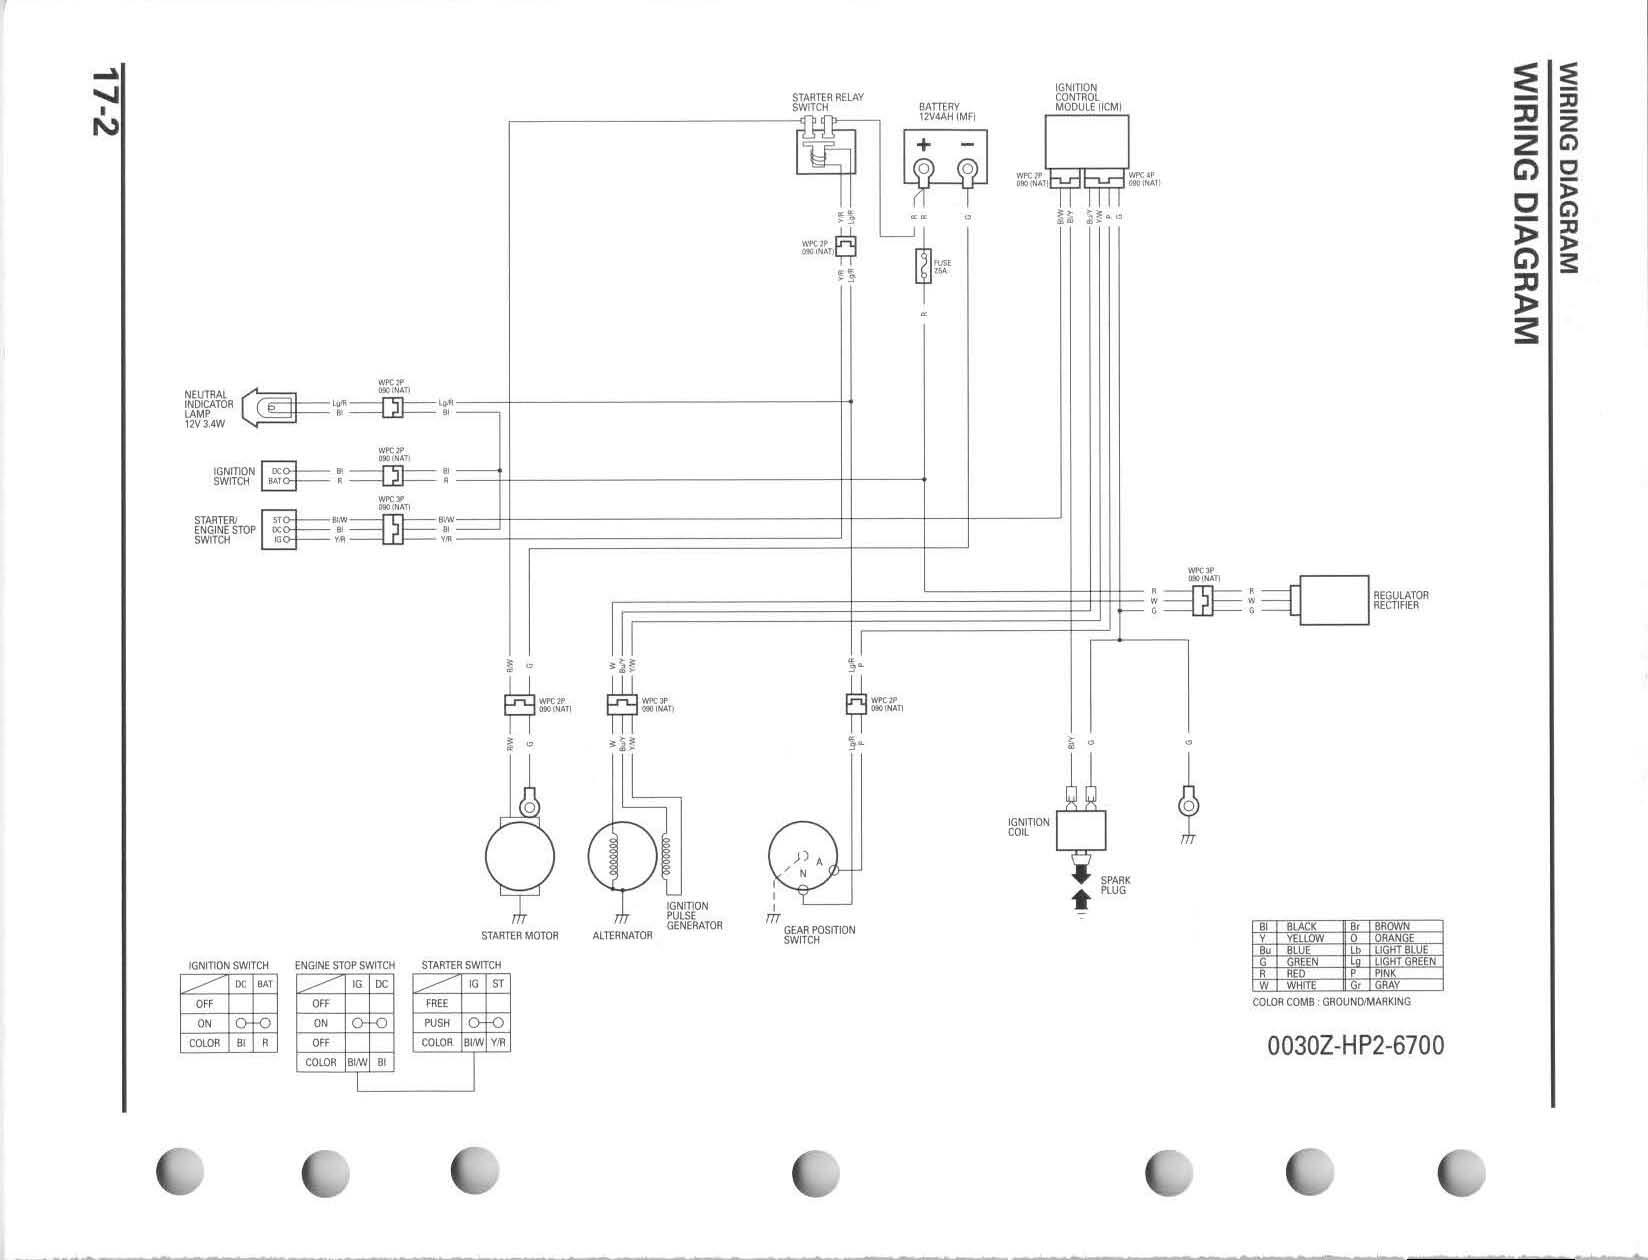 2006 TRX wiring | Honda TRX ATV Forum | Trx 90 Wiring Diagram |  | Honda TRX ATV Forum